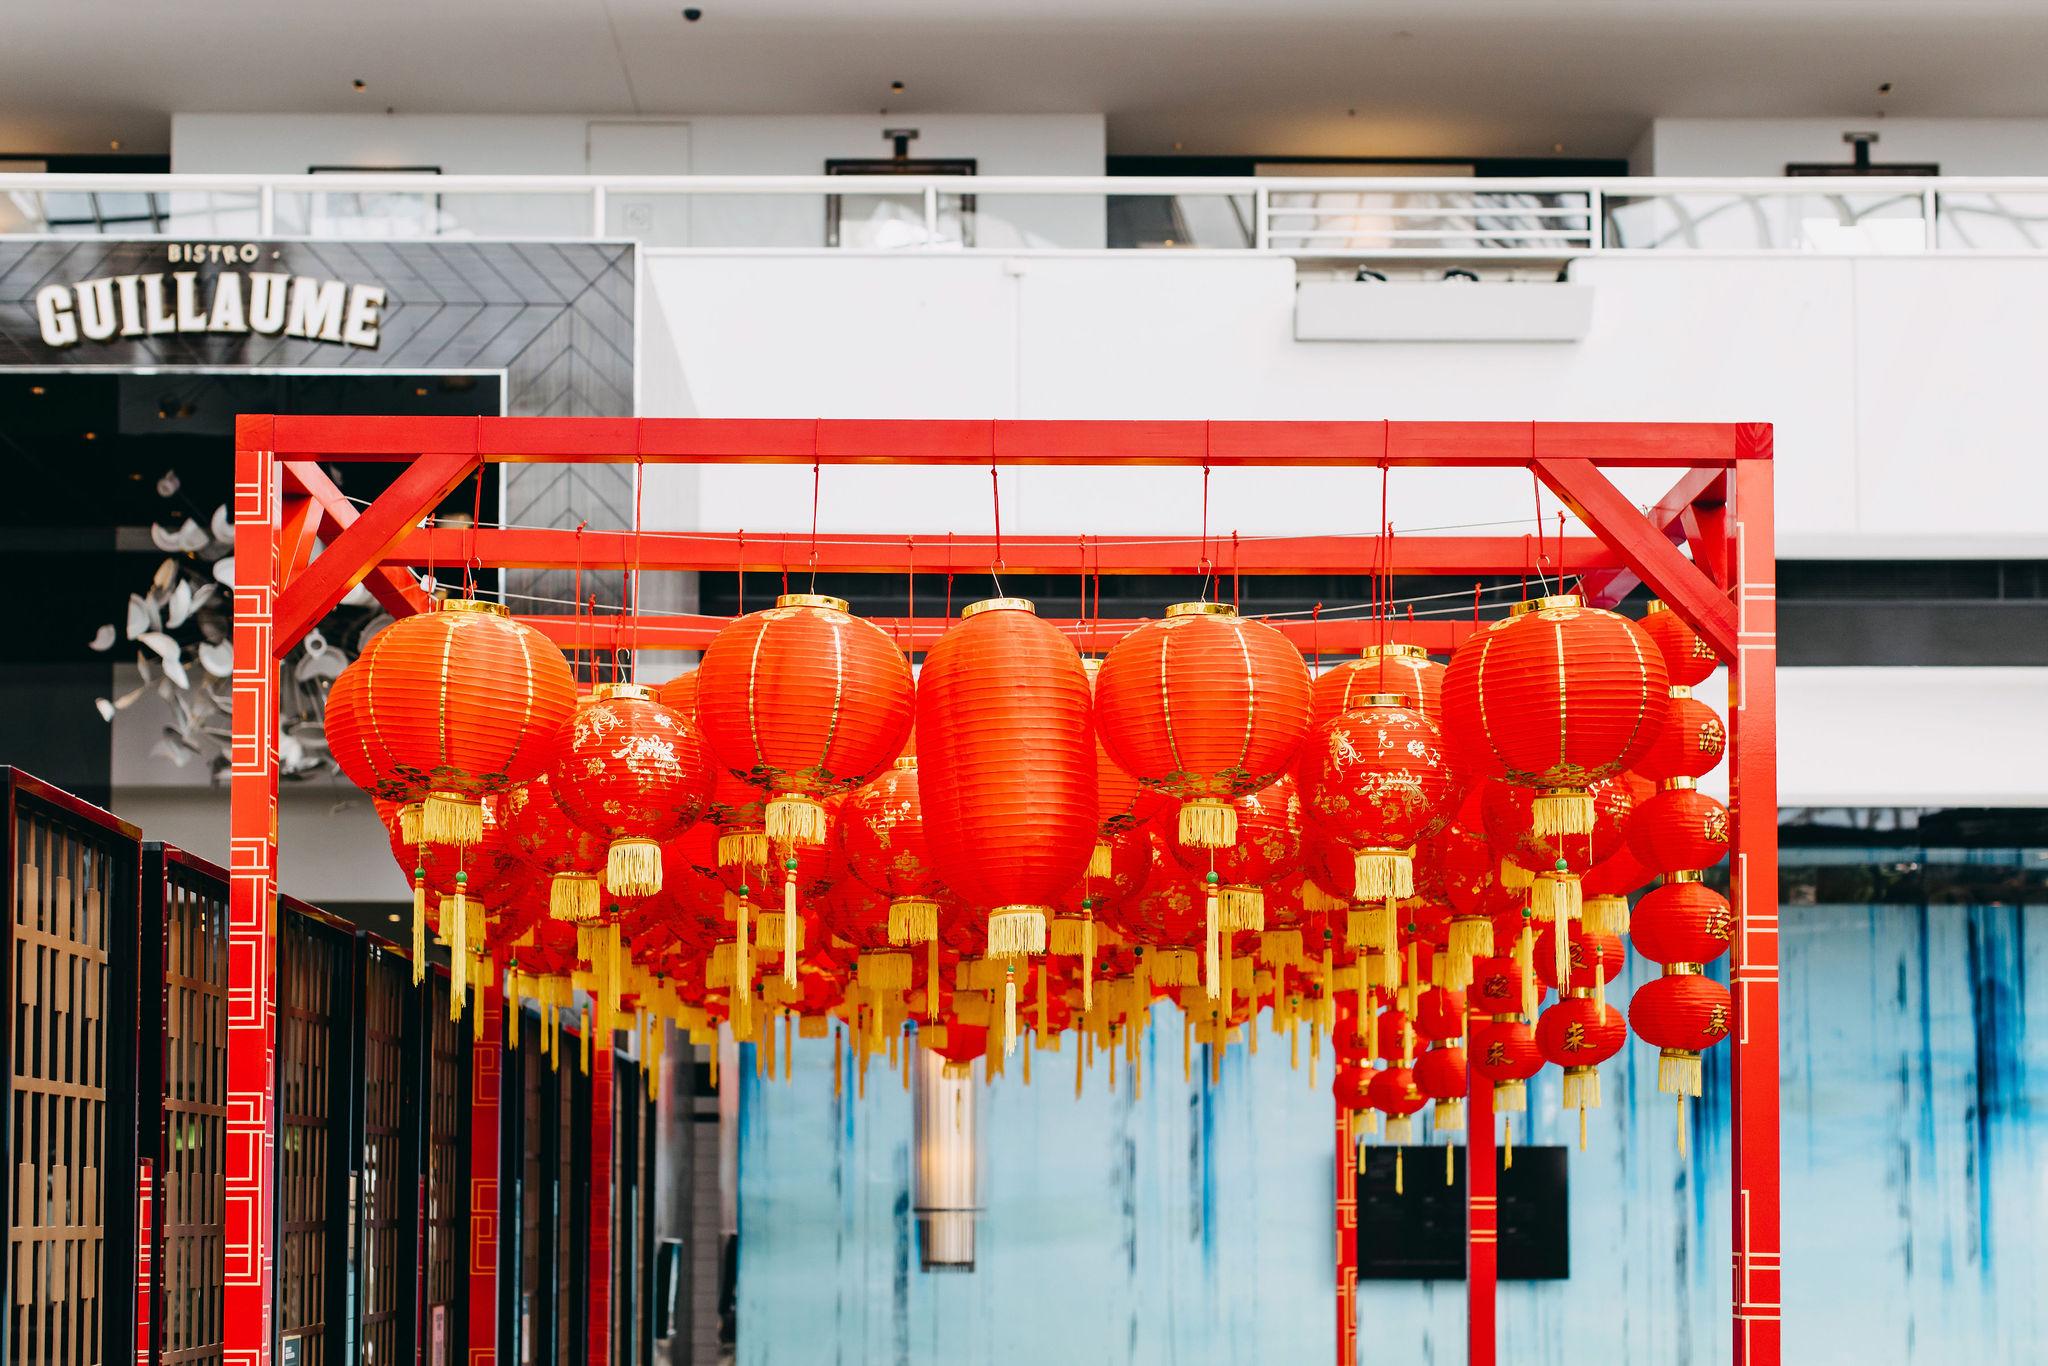 57-DUOEVENTS-CROWN-CHINESENEWYEAR-10FEB2021